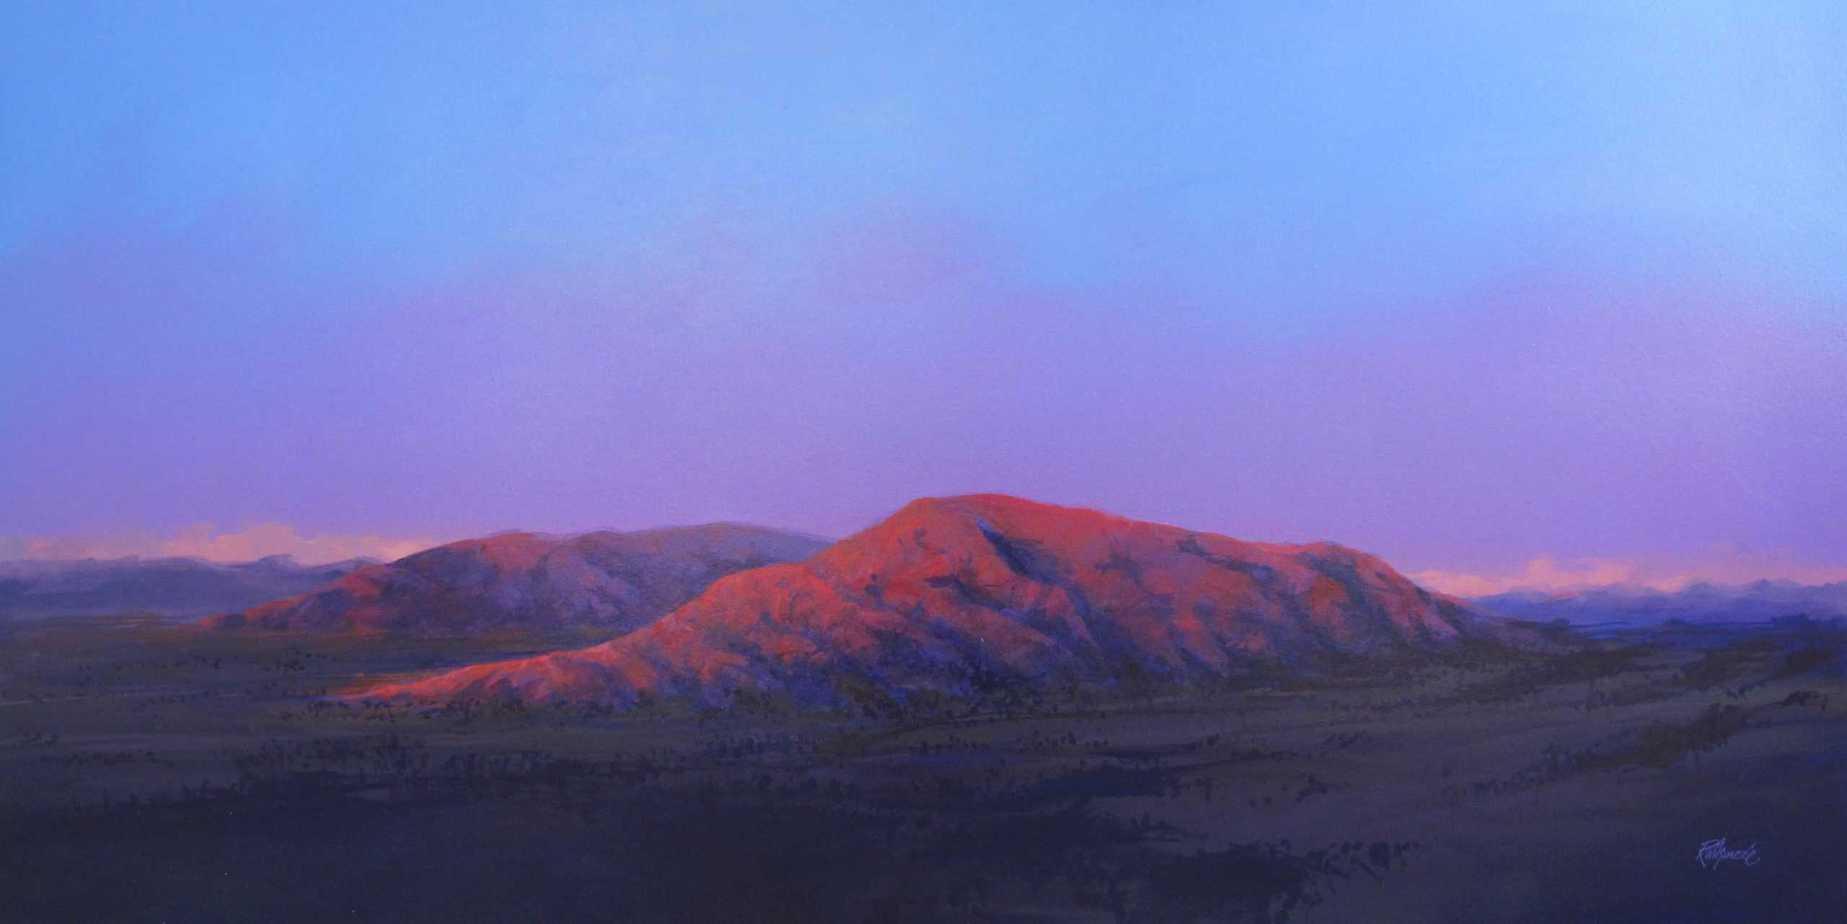 ross wilsomre - AUSTRALIAN ARTIST- ORIGINAL ARTWORKS AND PAINTINGS